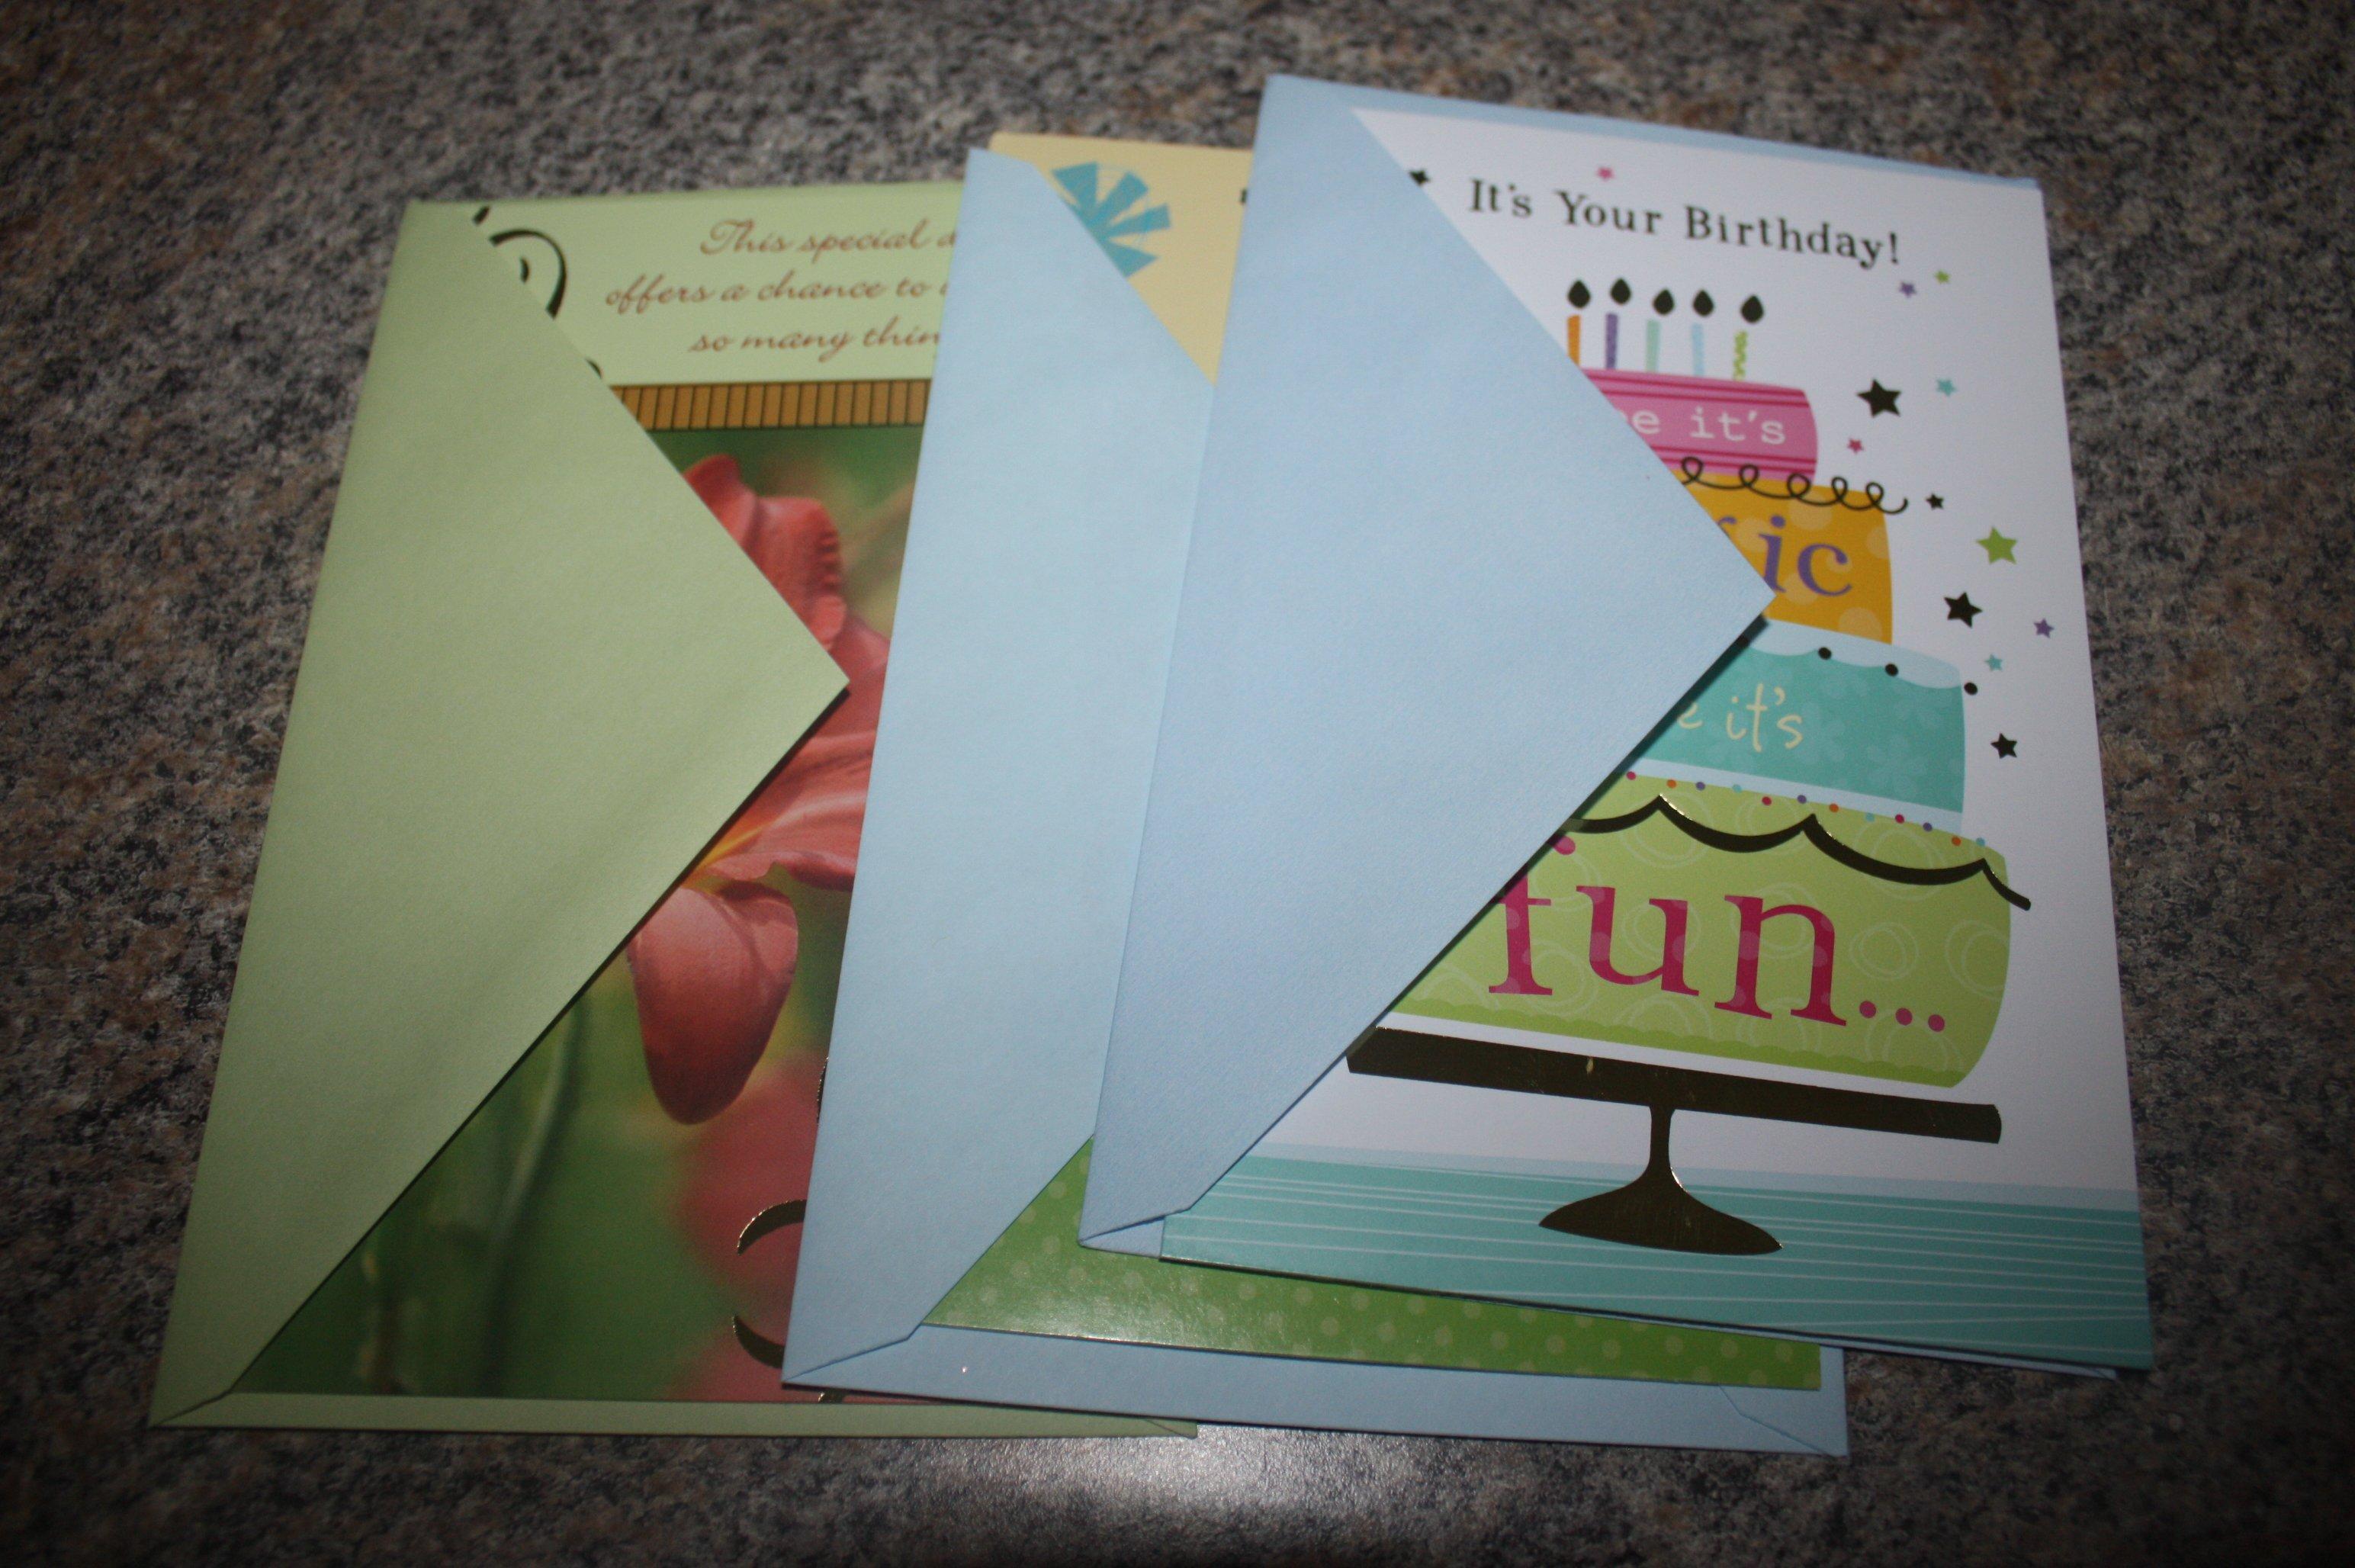 3 Free American Greeting Cards Cvs Midgetmomma